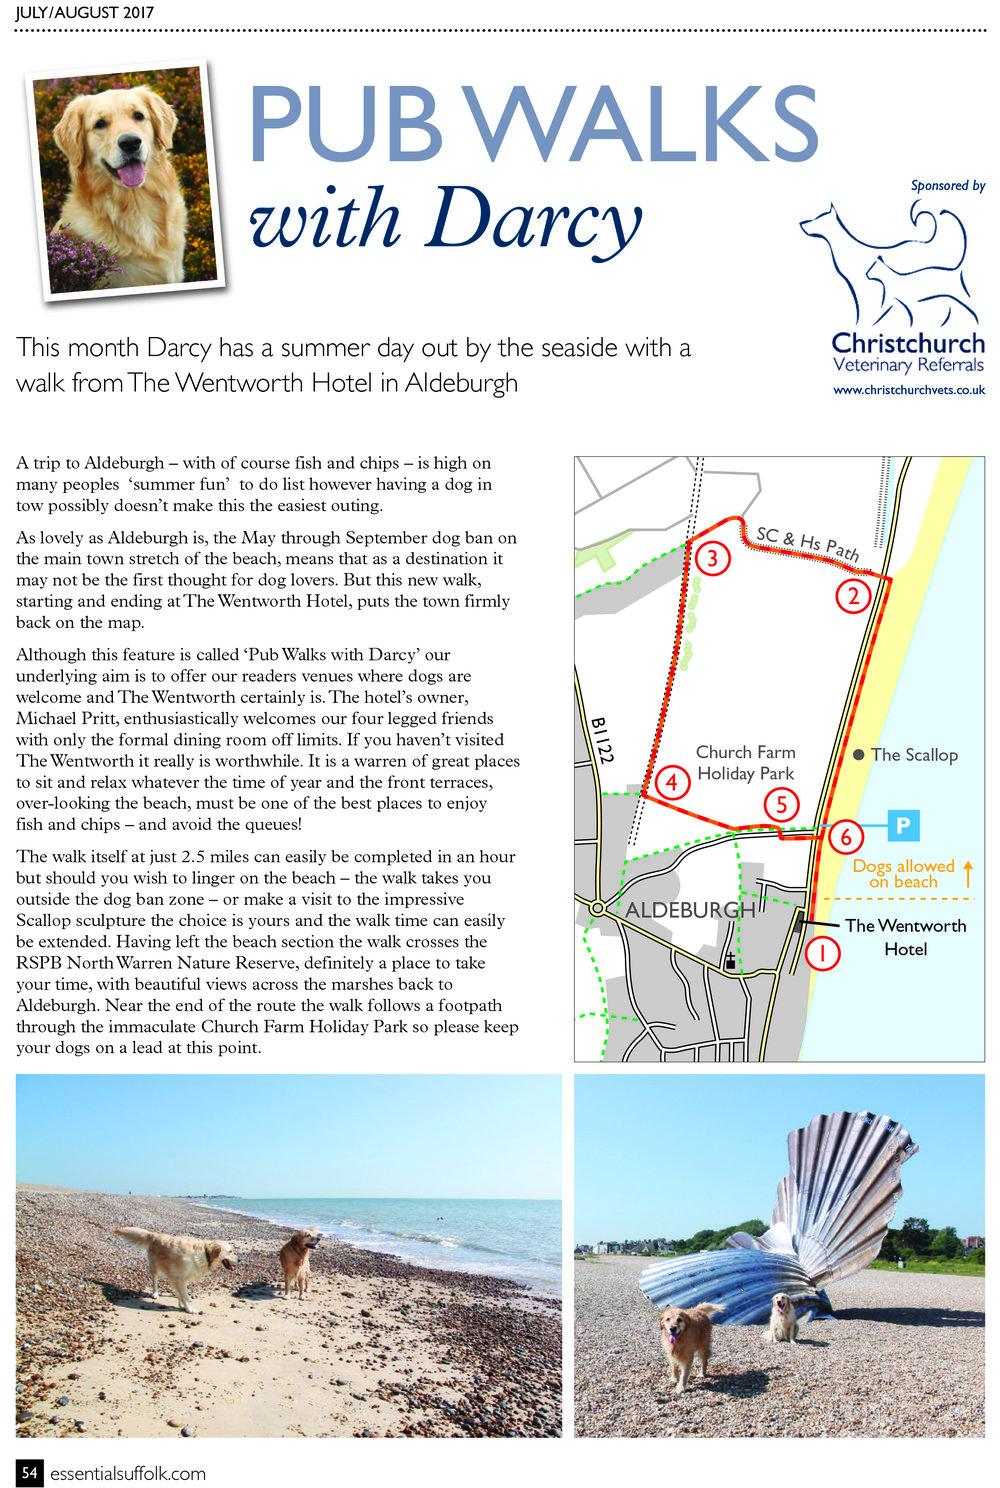 Aldeburgh Dog Walk route 1 page 1